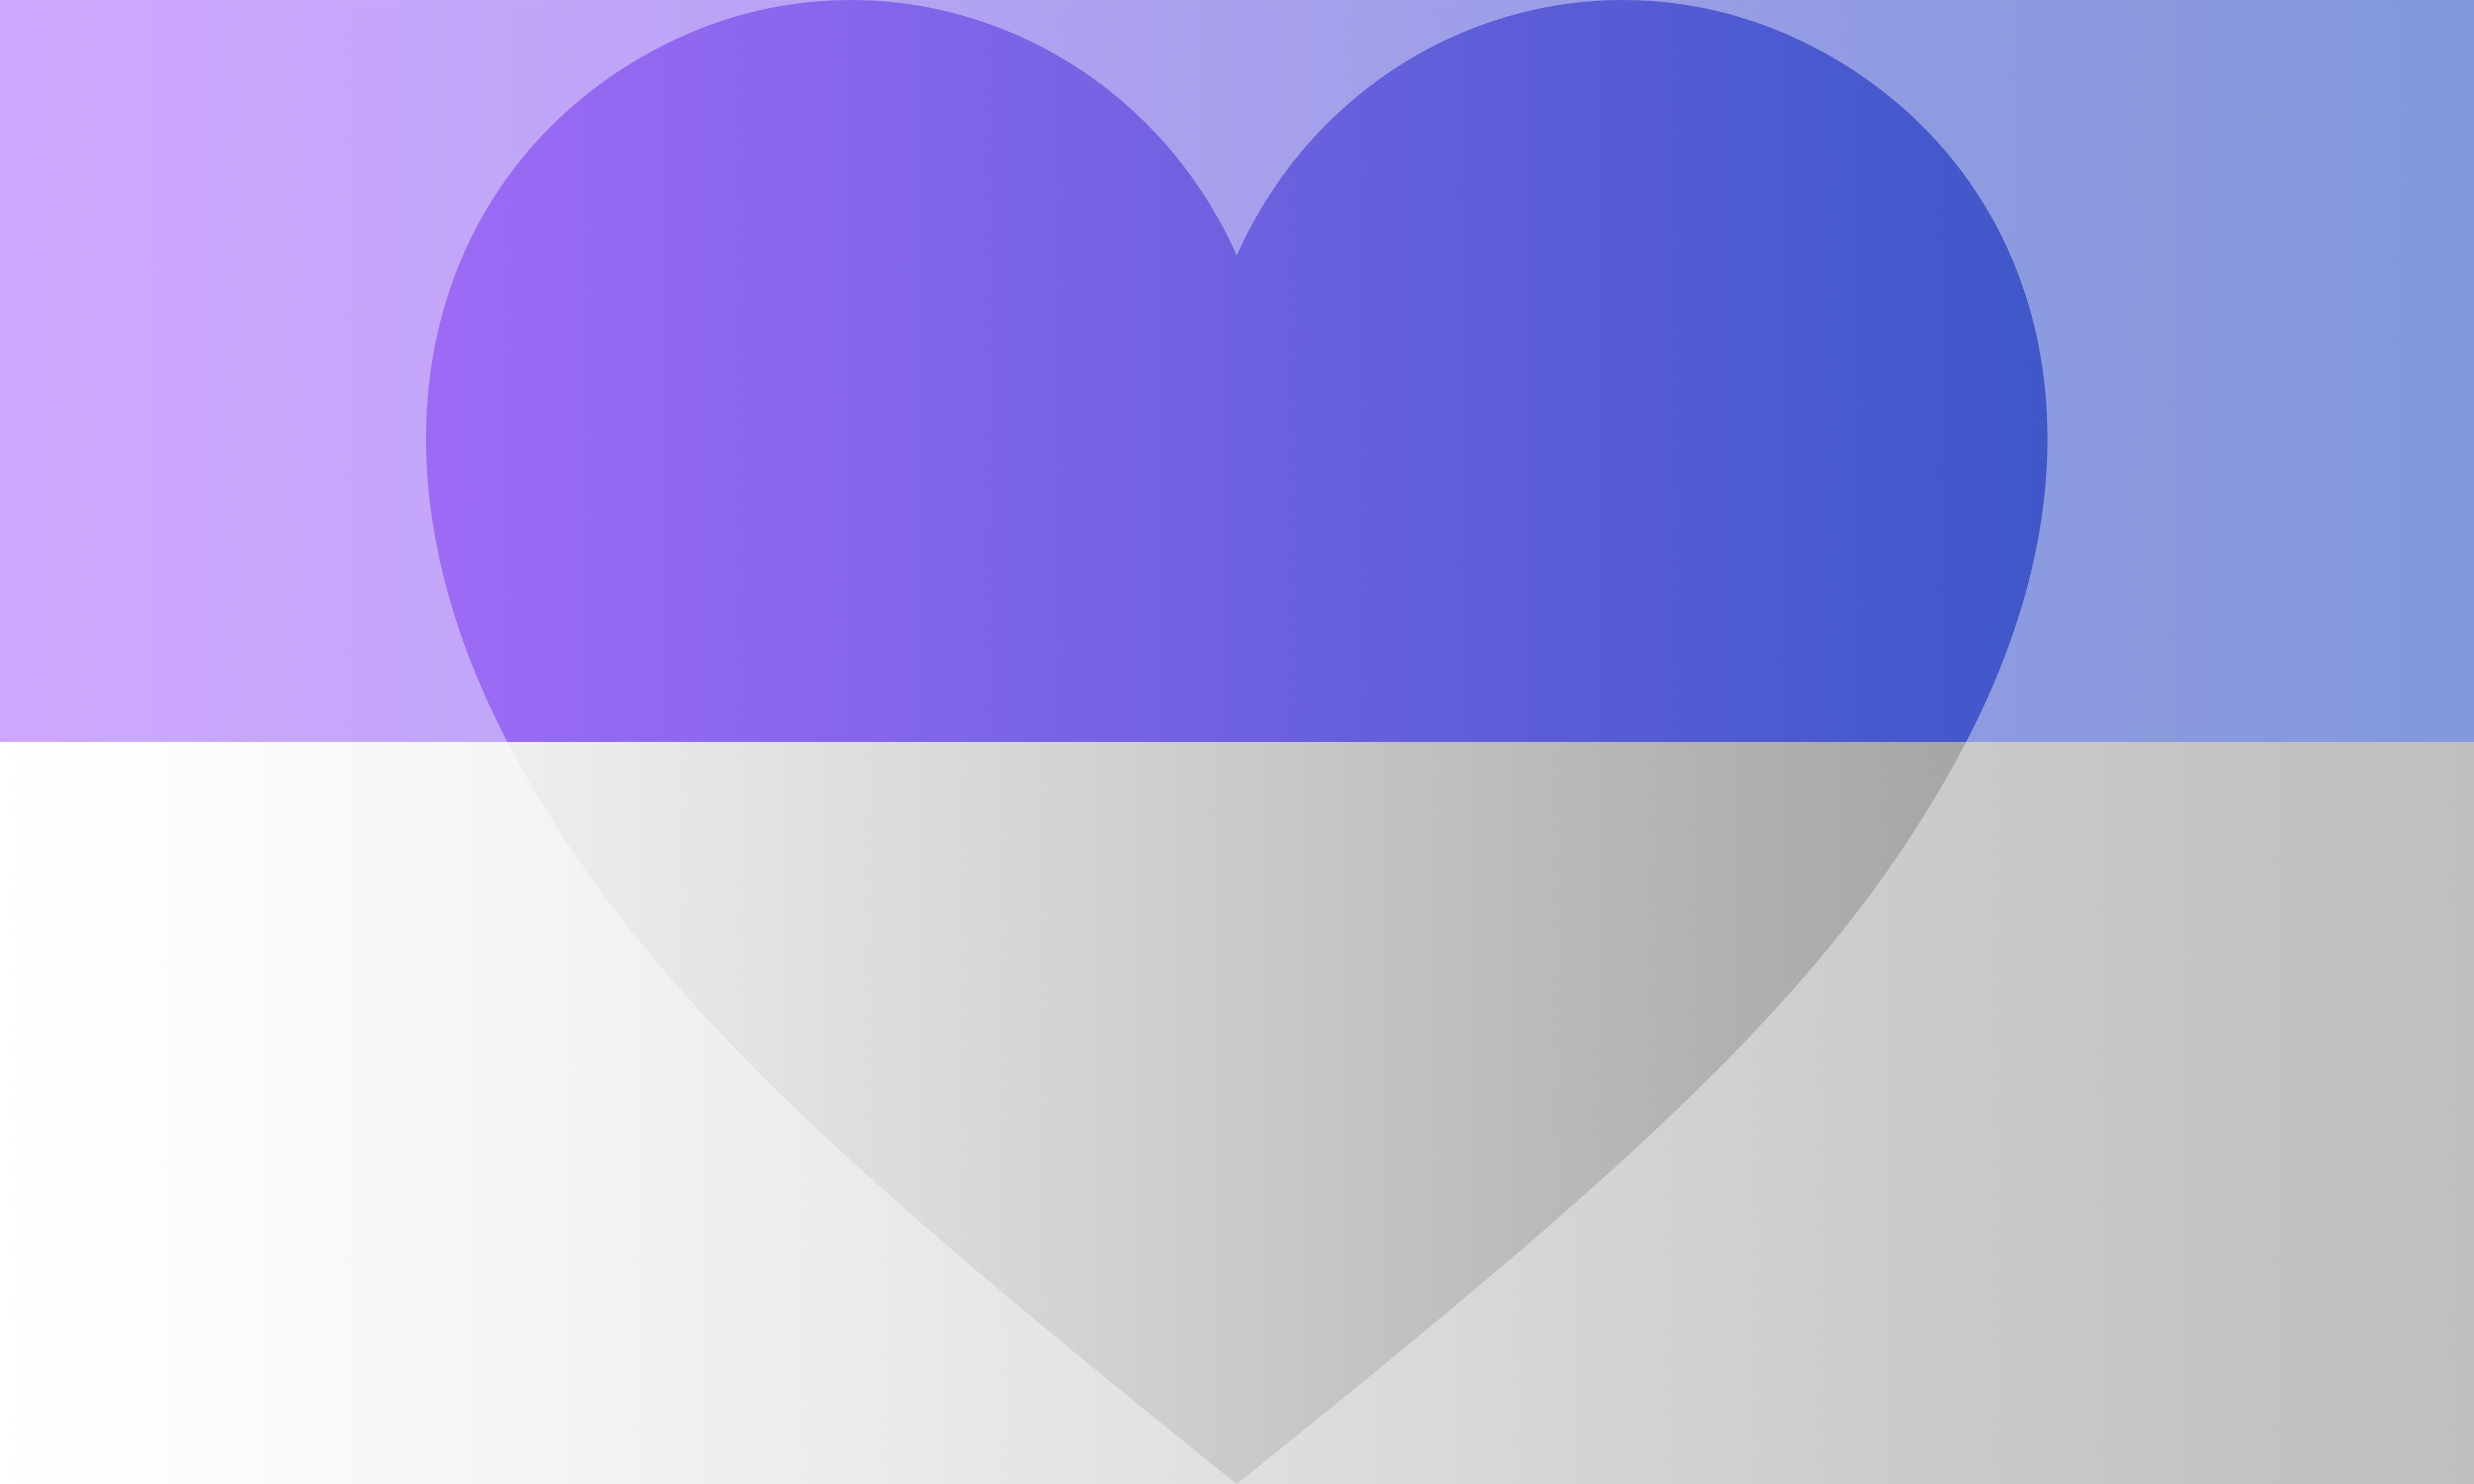 Nowomaromantic Pride Flag